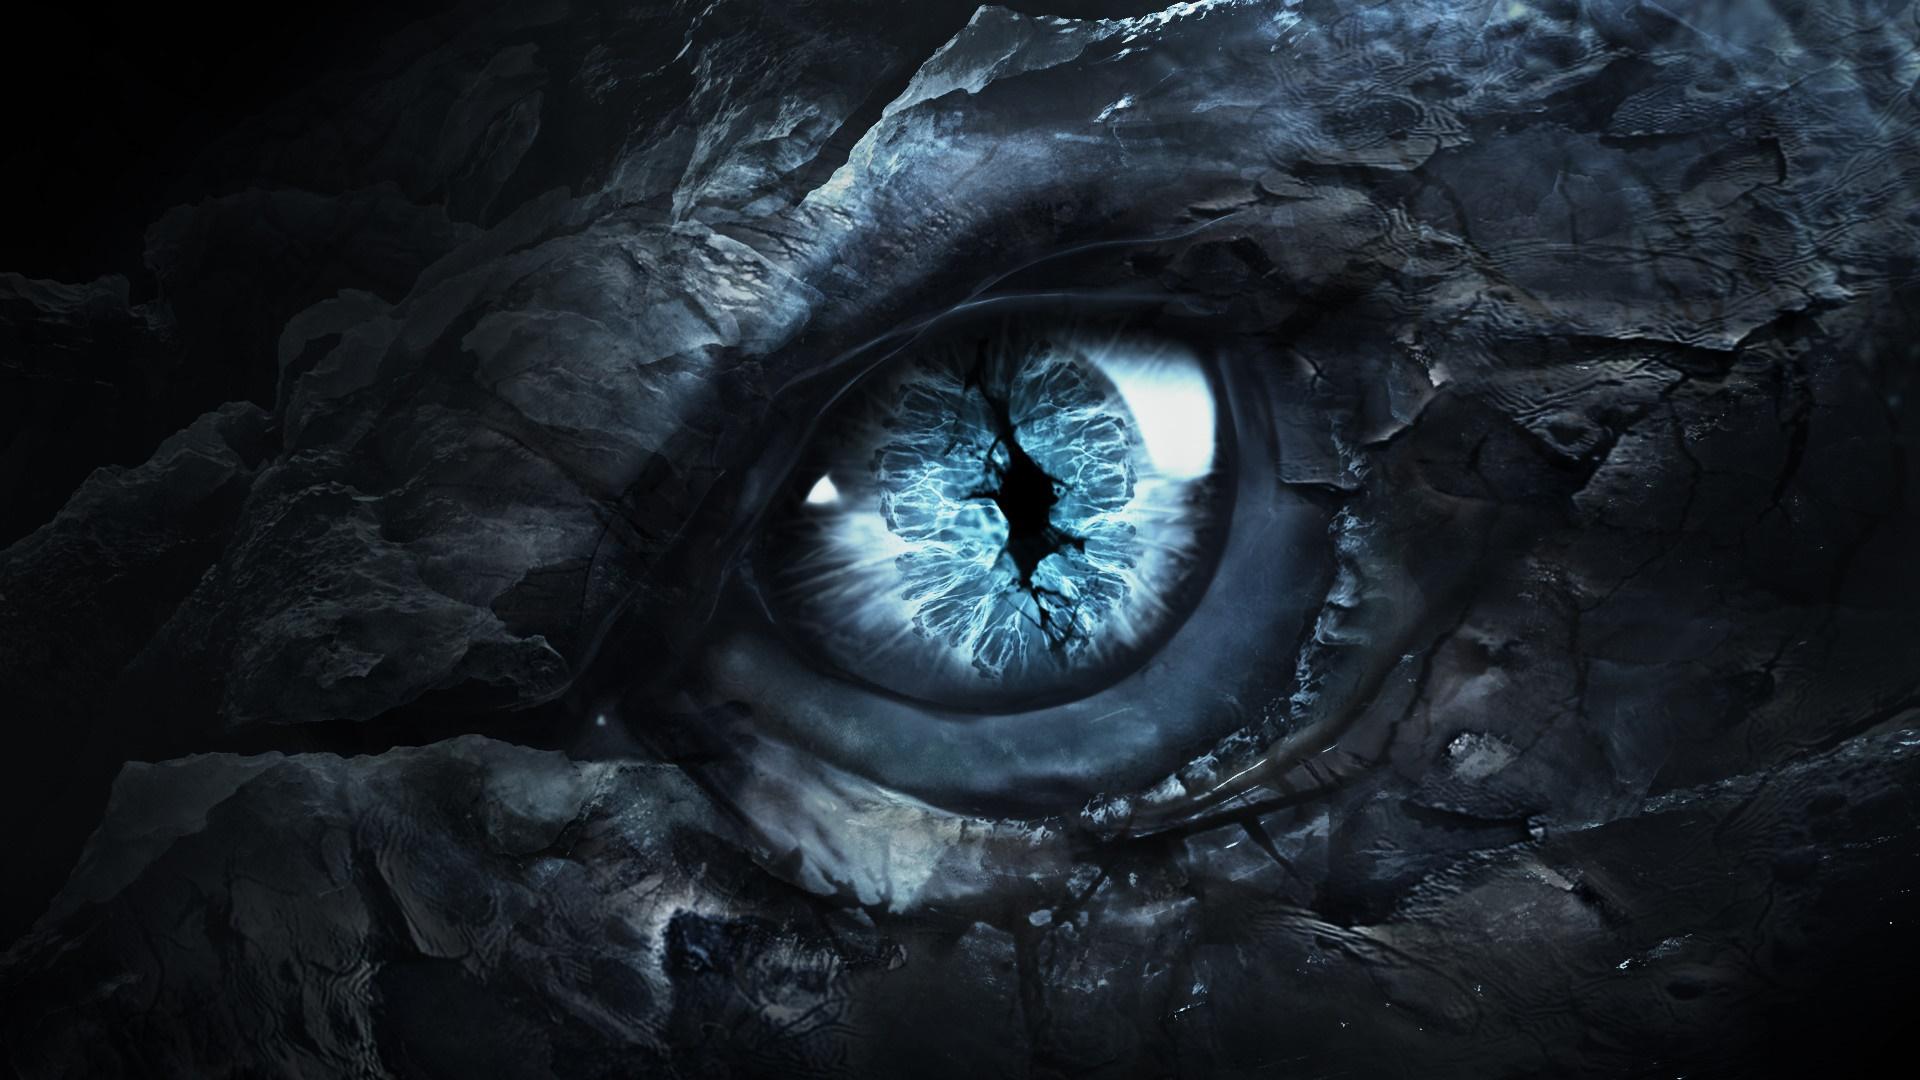 Image Game Of Thrones Dragon Eyes Fantasy Film Closeup